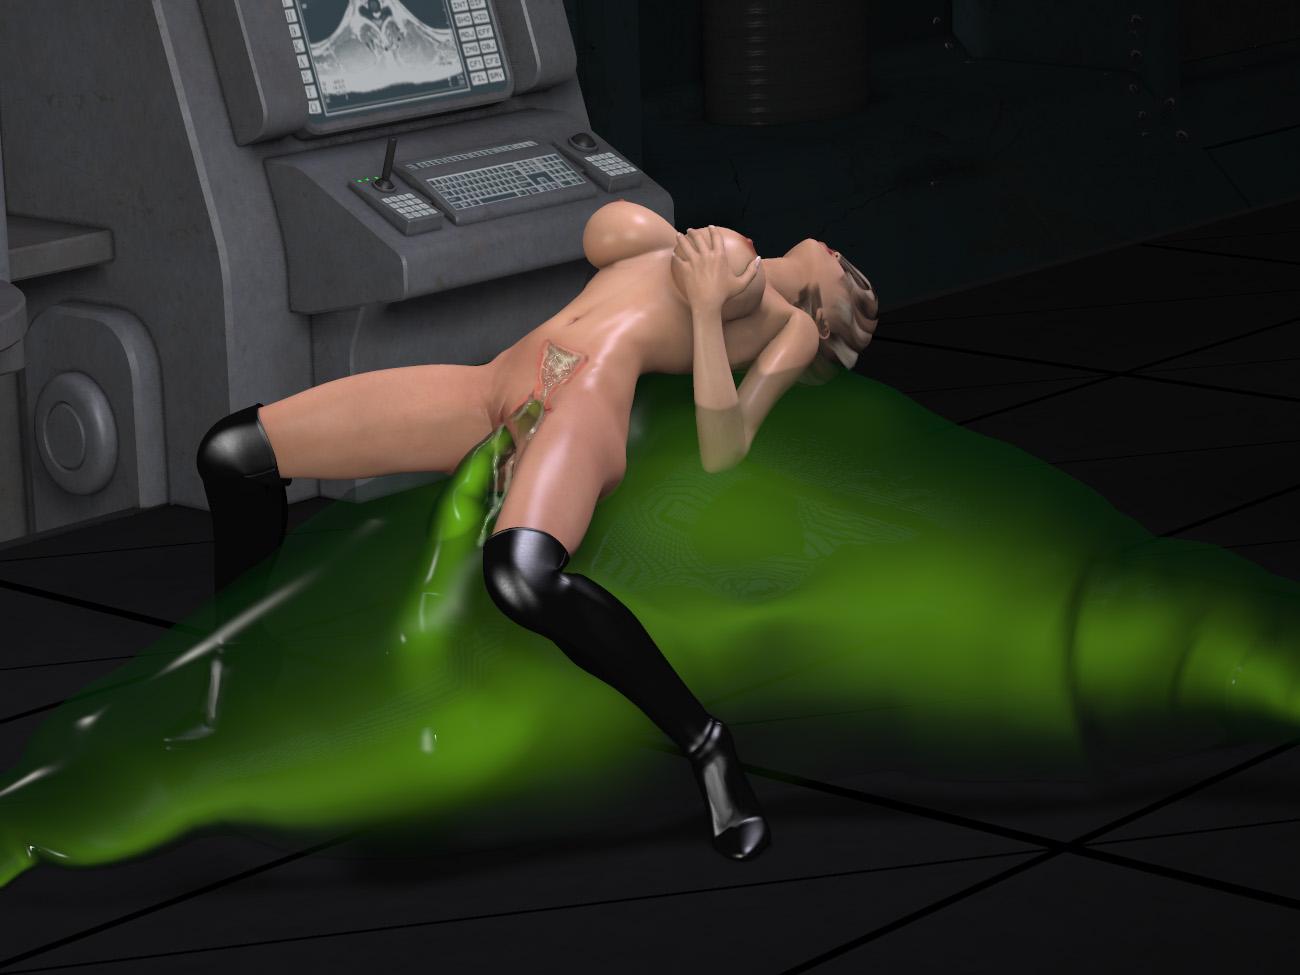 3dsex x-rays nude tubes